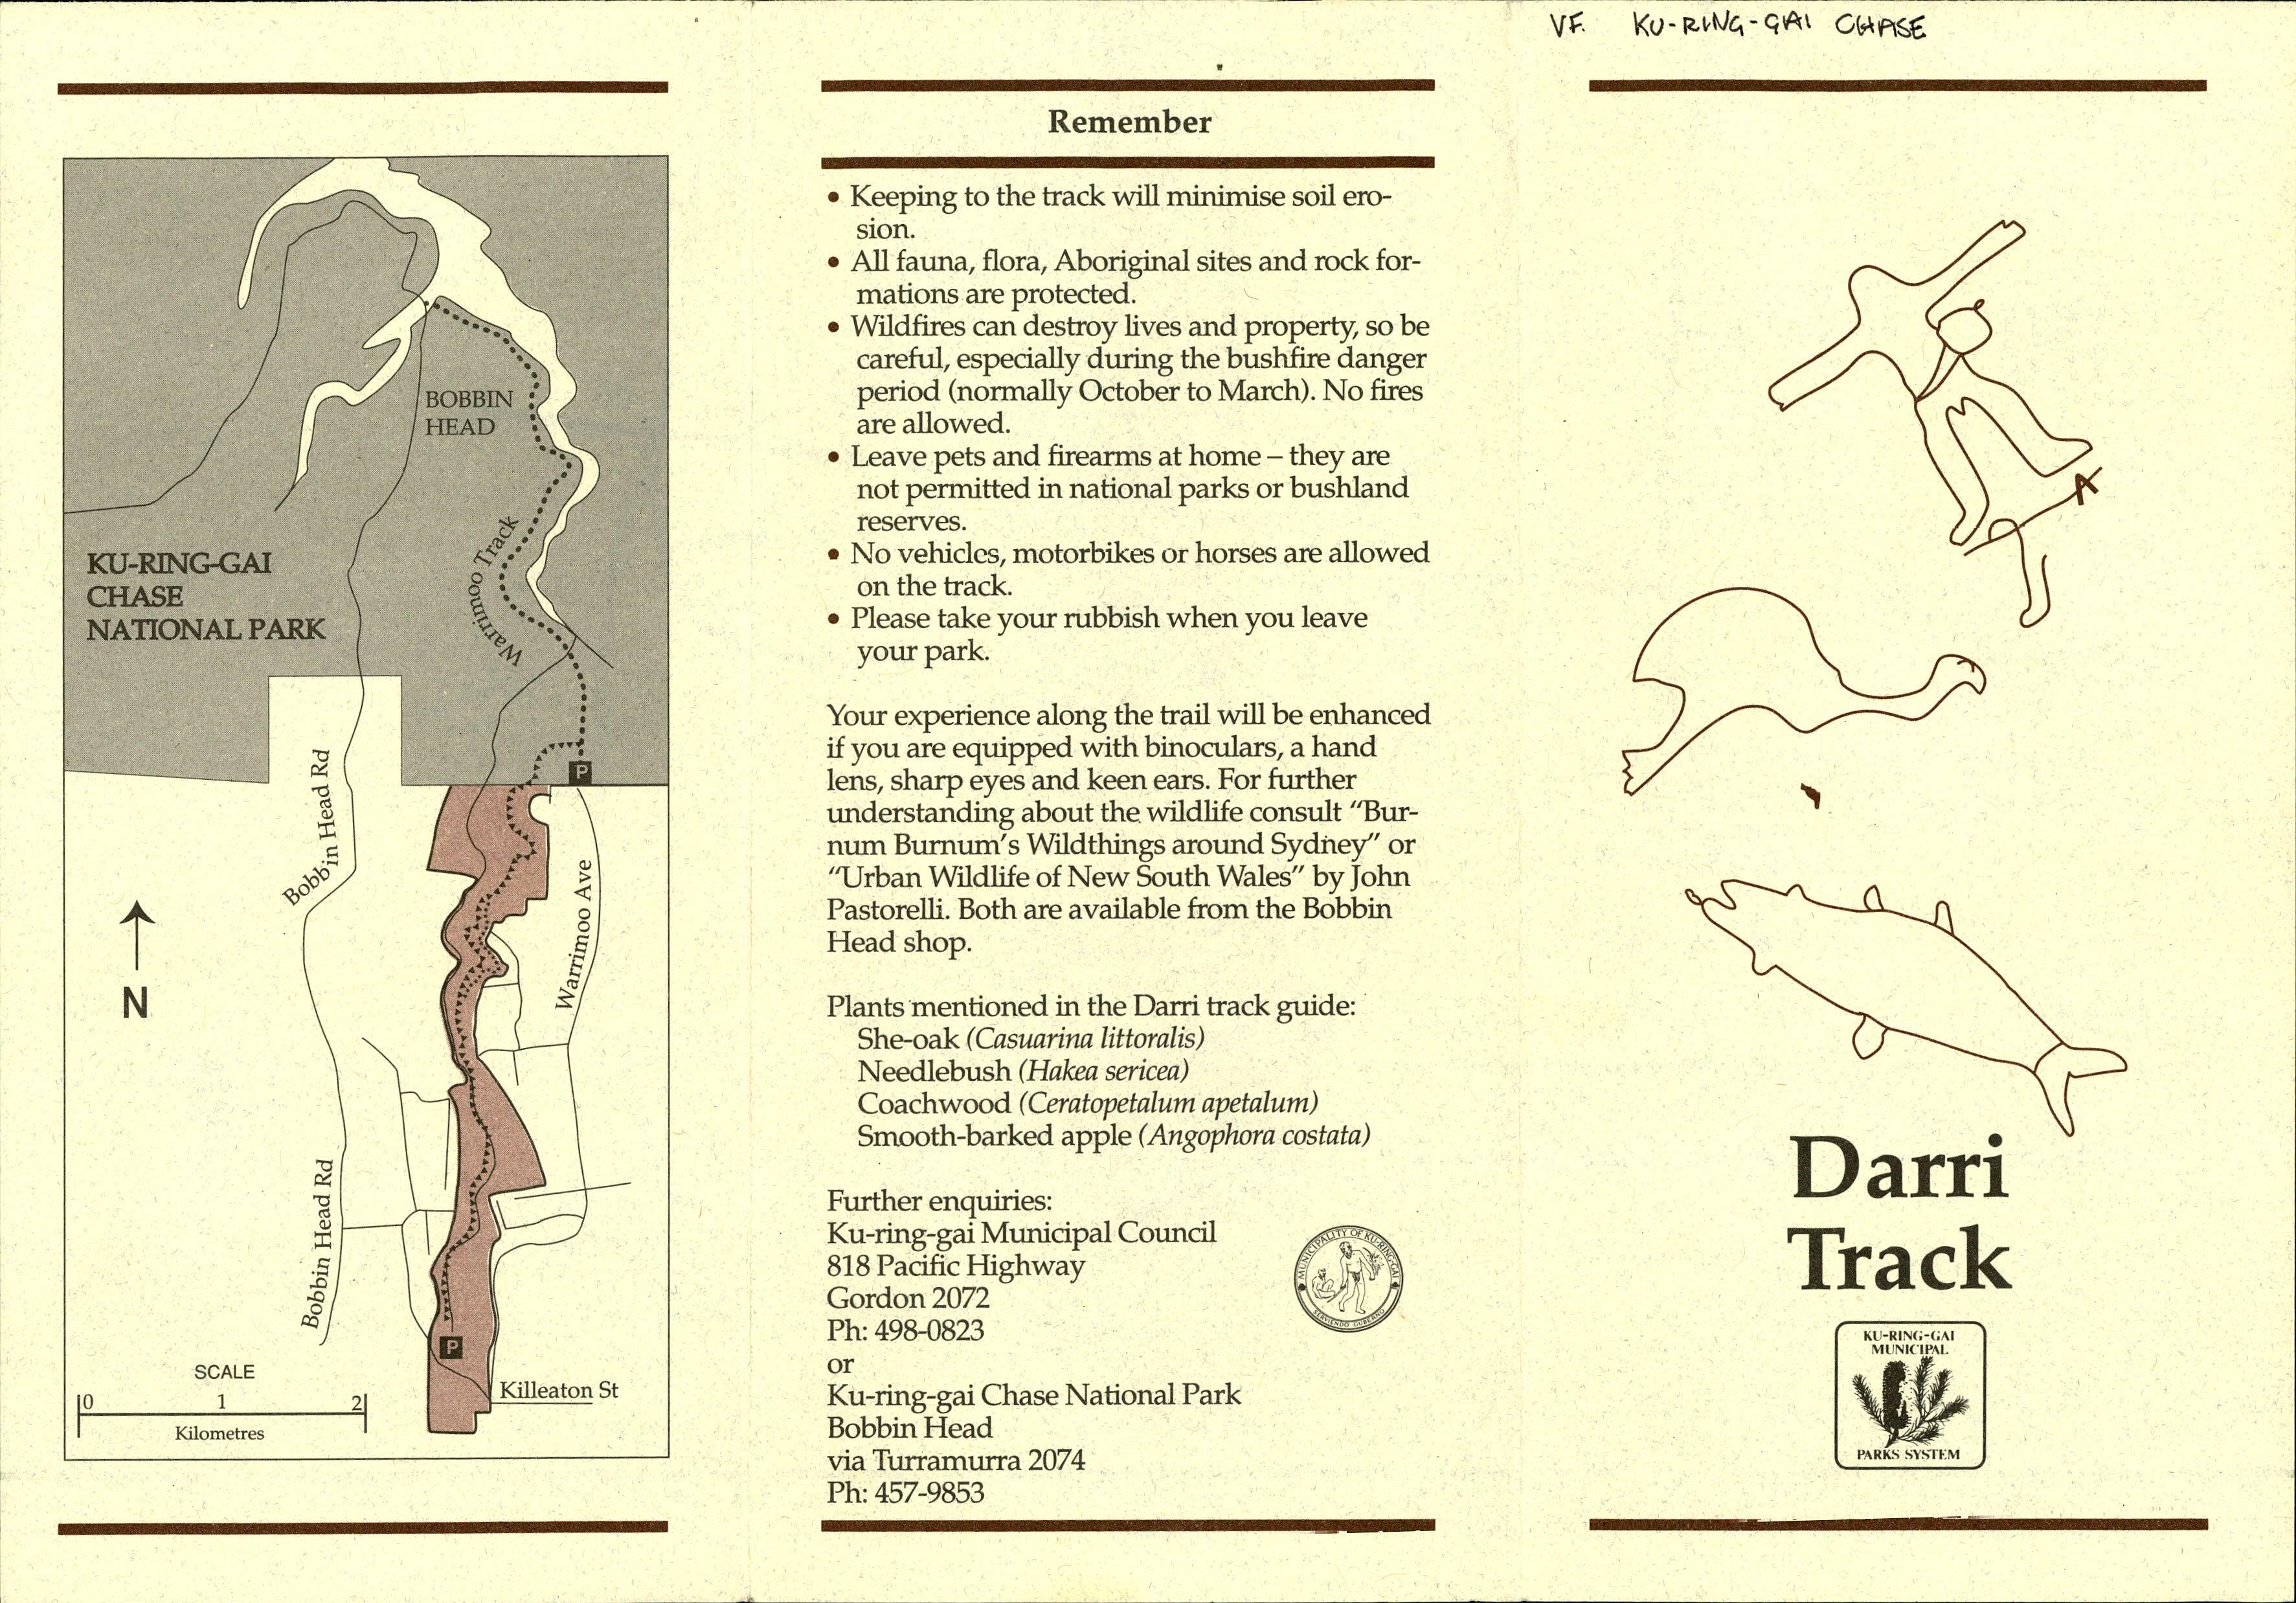 Ku Ring Gai Chase S601365000.pdf.00059 Darri Track (North Turramurra)